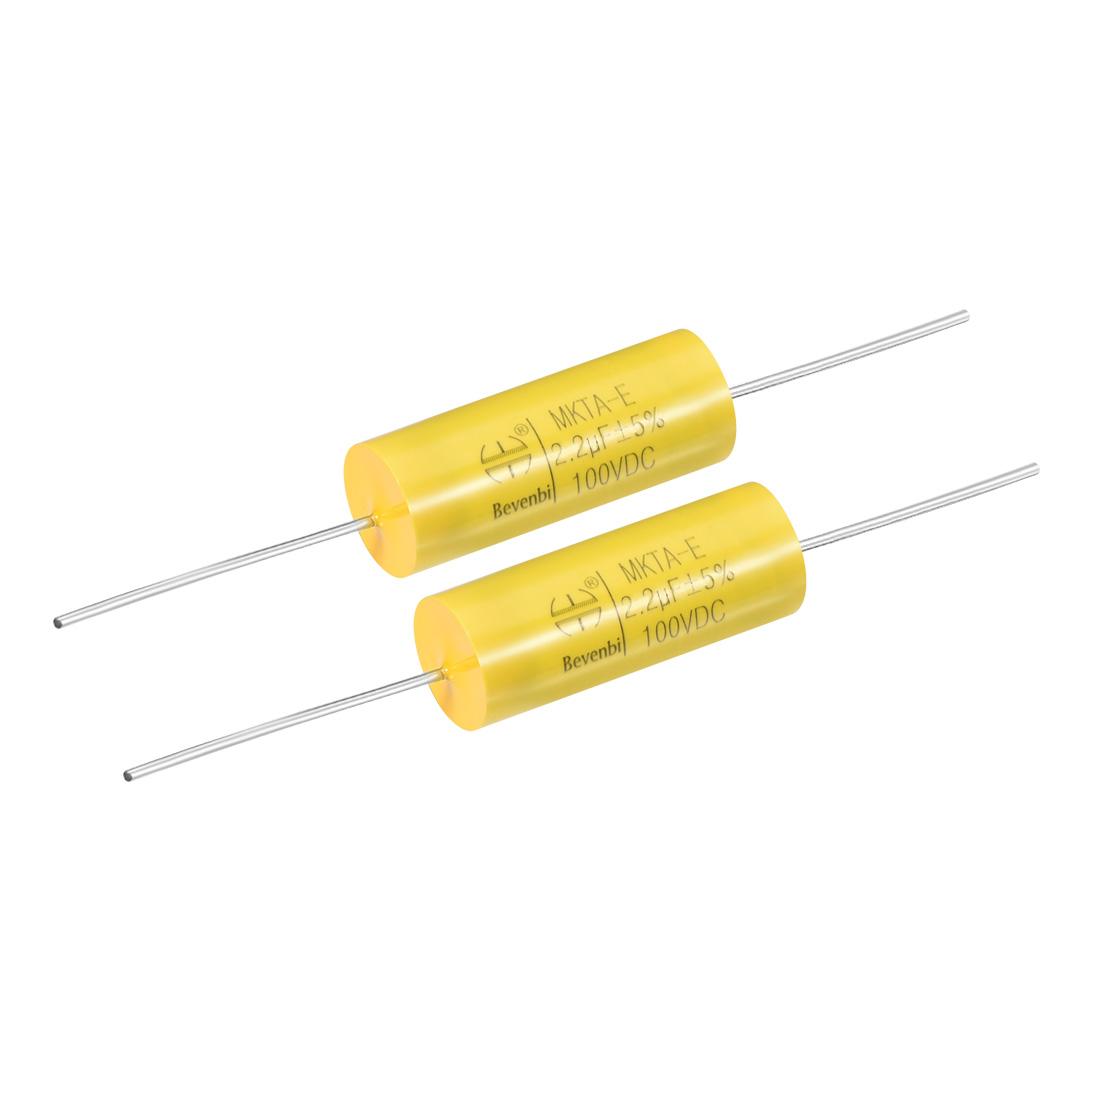 Film Capacitor 100V DC 2.2uF MKTA-E Round Polypropylene Capacitors Yellow 2pcs